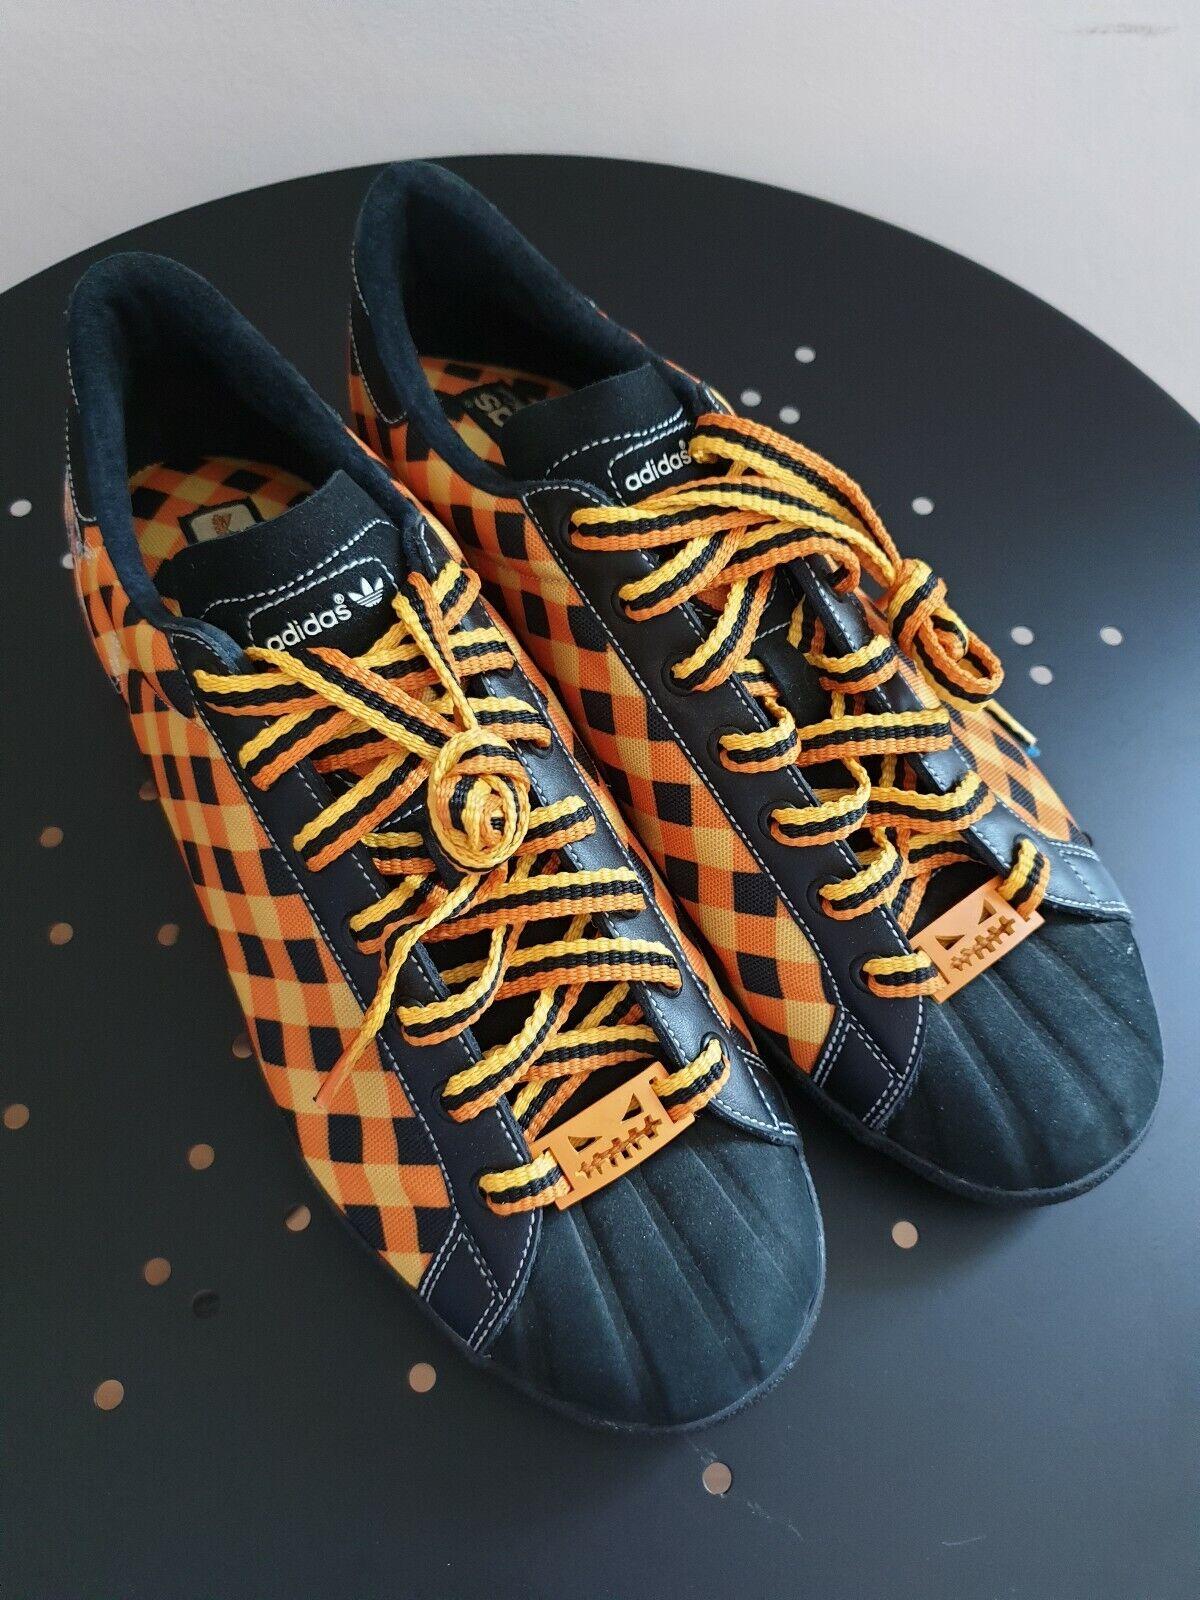 Zapatos Adidas cortos flavour of the Month  3 nuevo